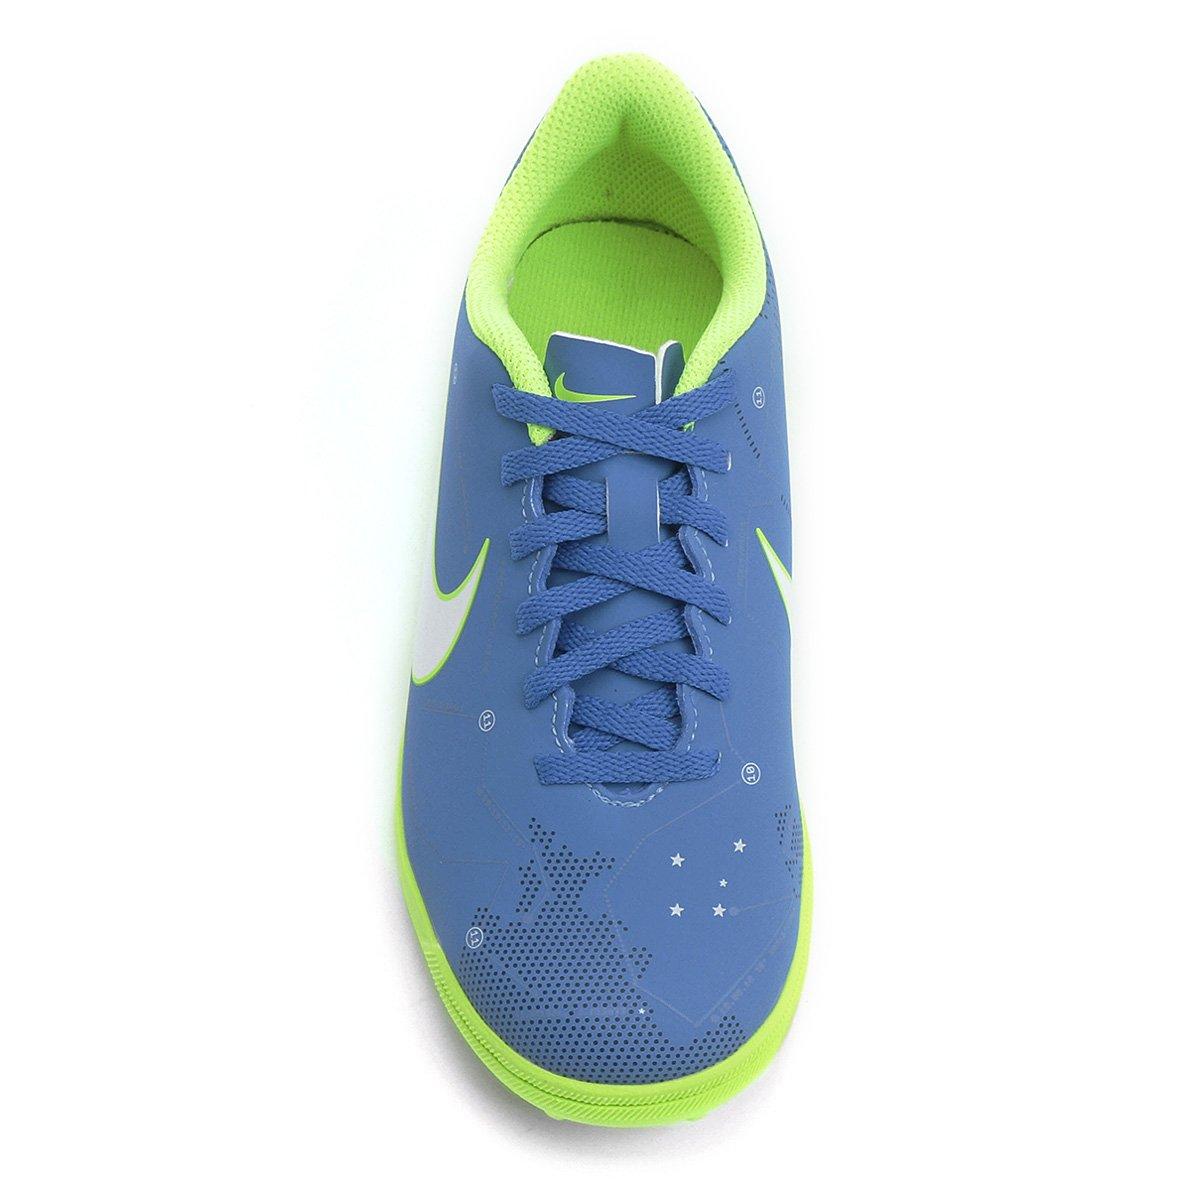 5ae86d7caa Chuteira Society Infantil Nike Mercurial Vortex 3 Neymar Jr TF ...